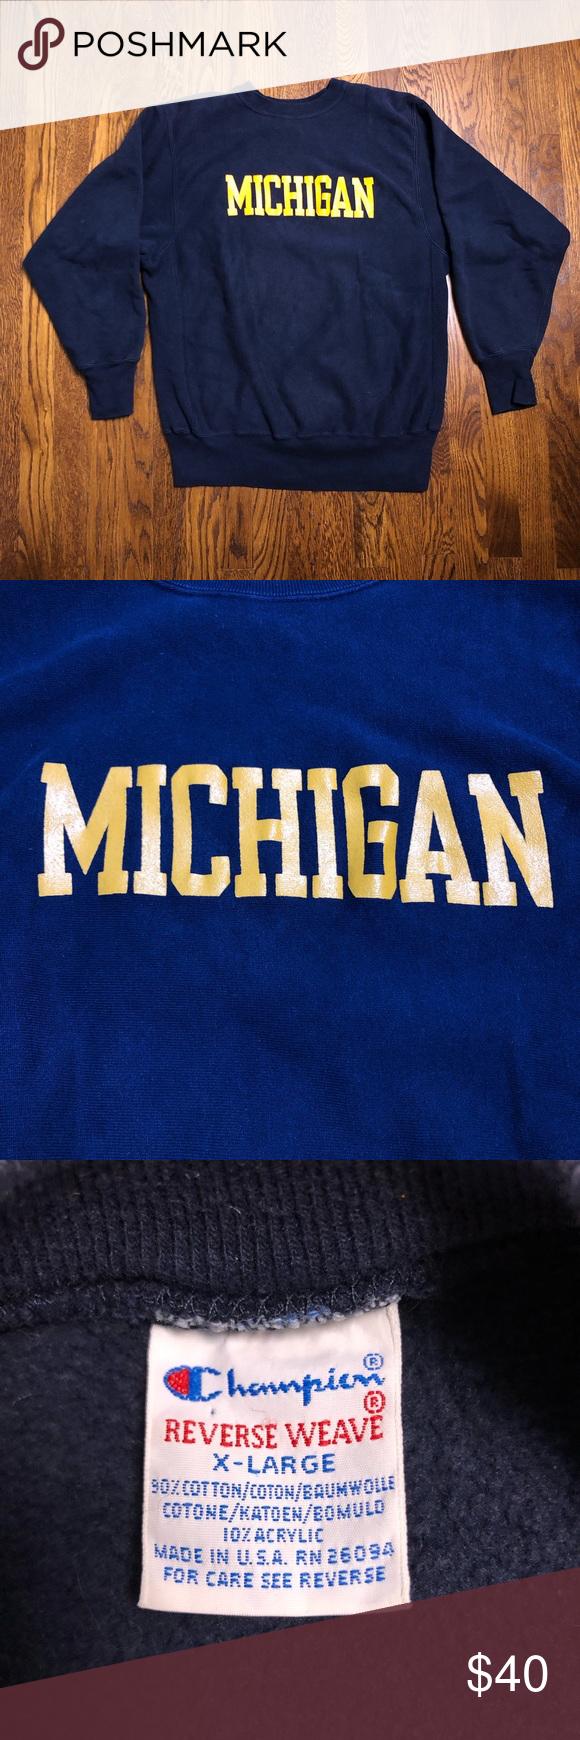 Champion Reverse Weave Michigan Wolverines Champion Reverse Weave Sweatshirt Shirt Michigan Wolverines [ 1740 x 580 Pixel ]